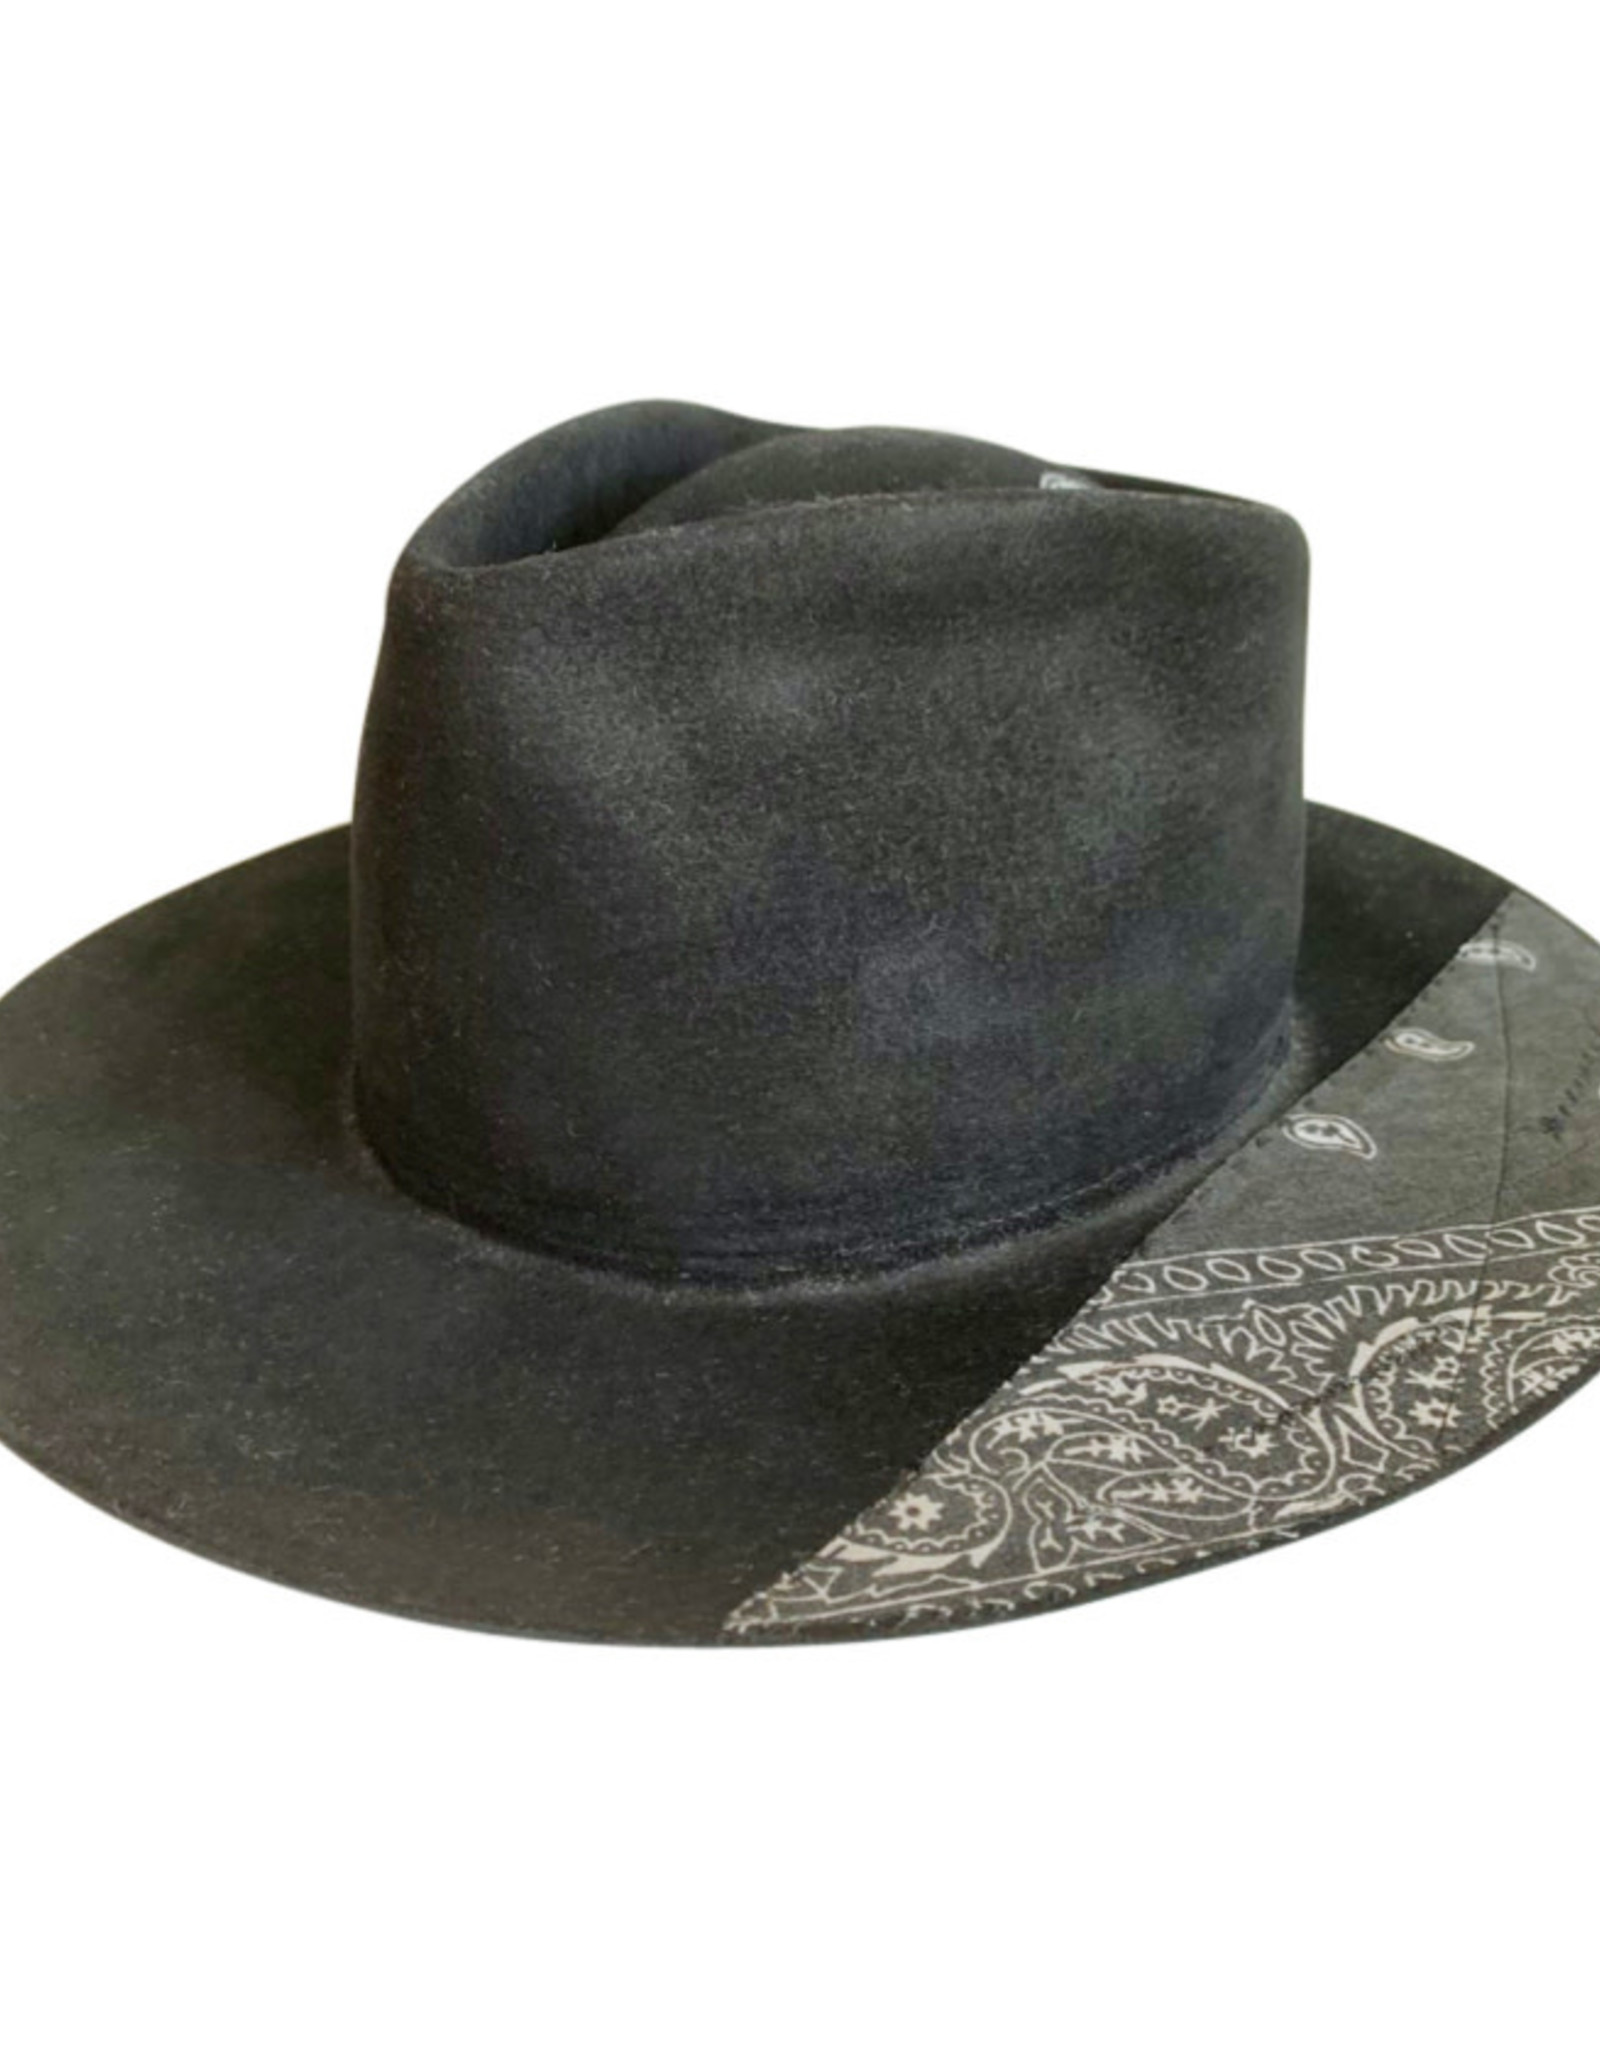 Teressa Foglia The Bandana Hat